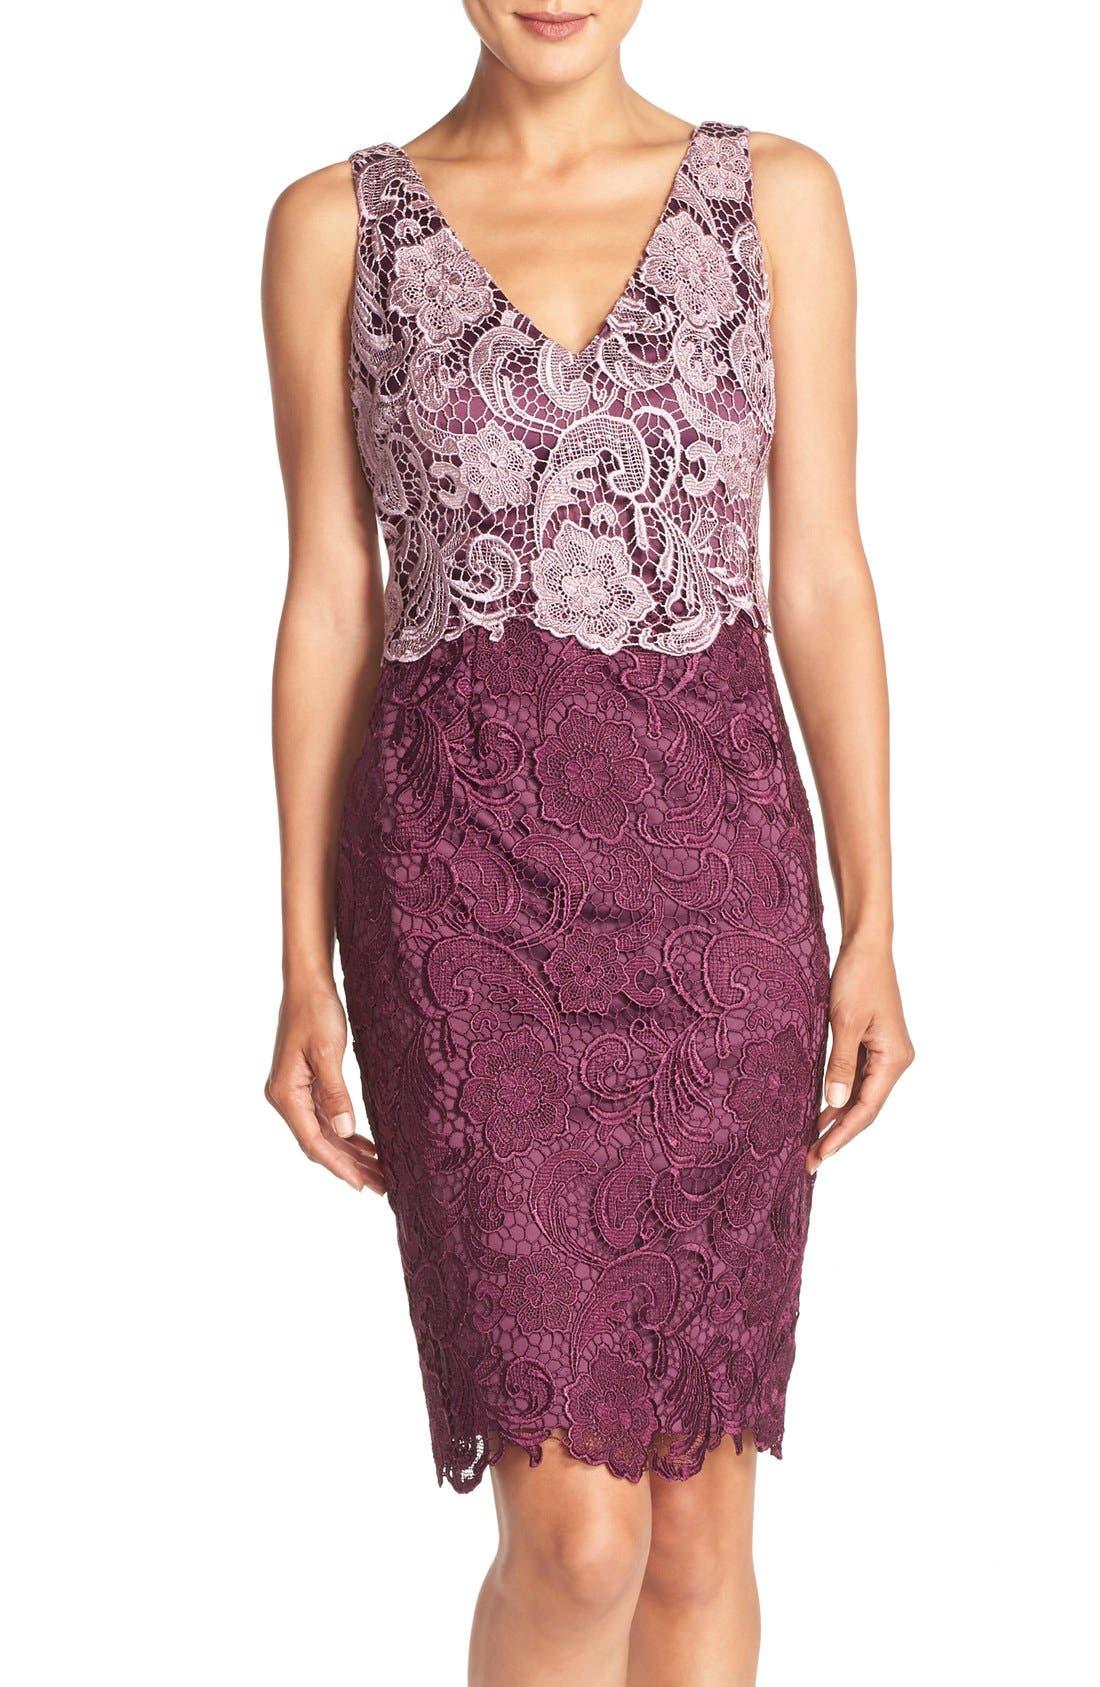 Alternate Image 1 Selected - Adrianna Papell Colorblock Floral Lace Sheath Dress (Regular & Petite)